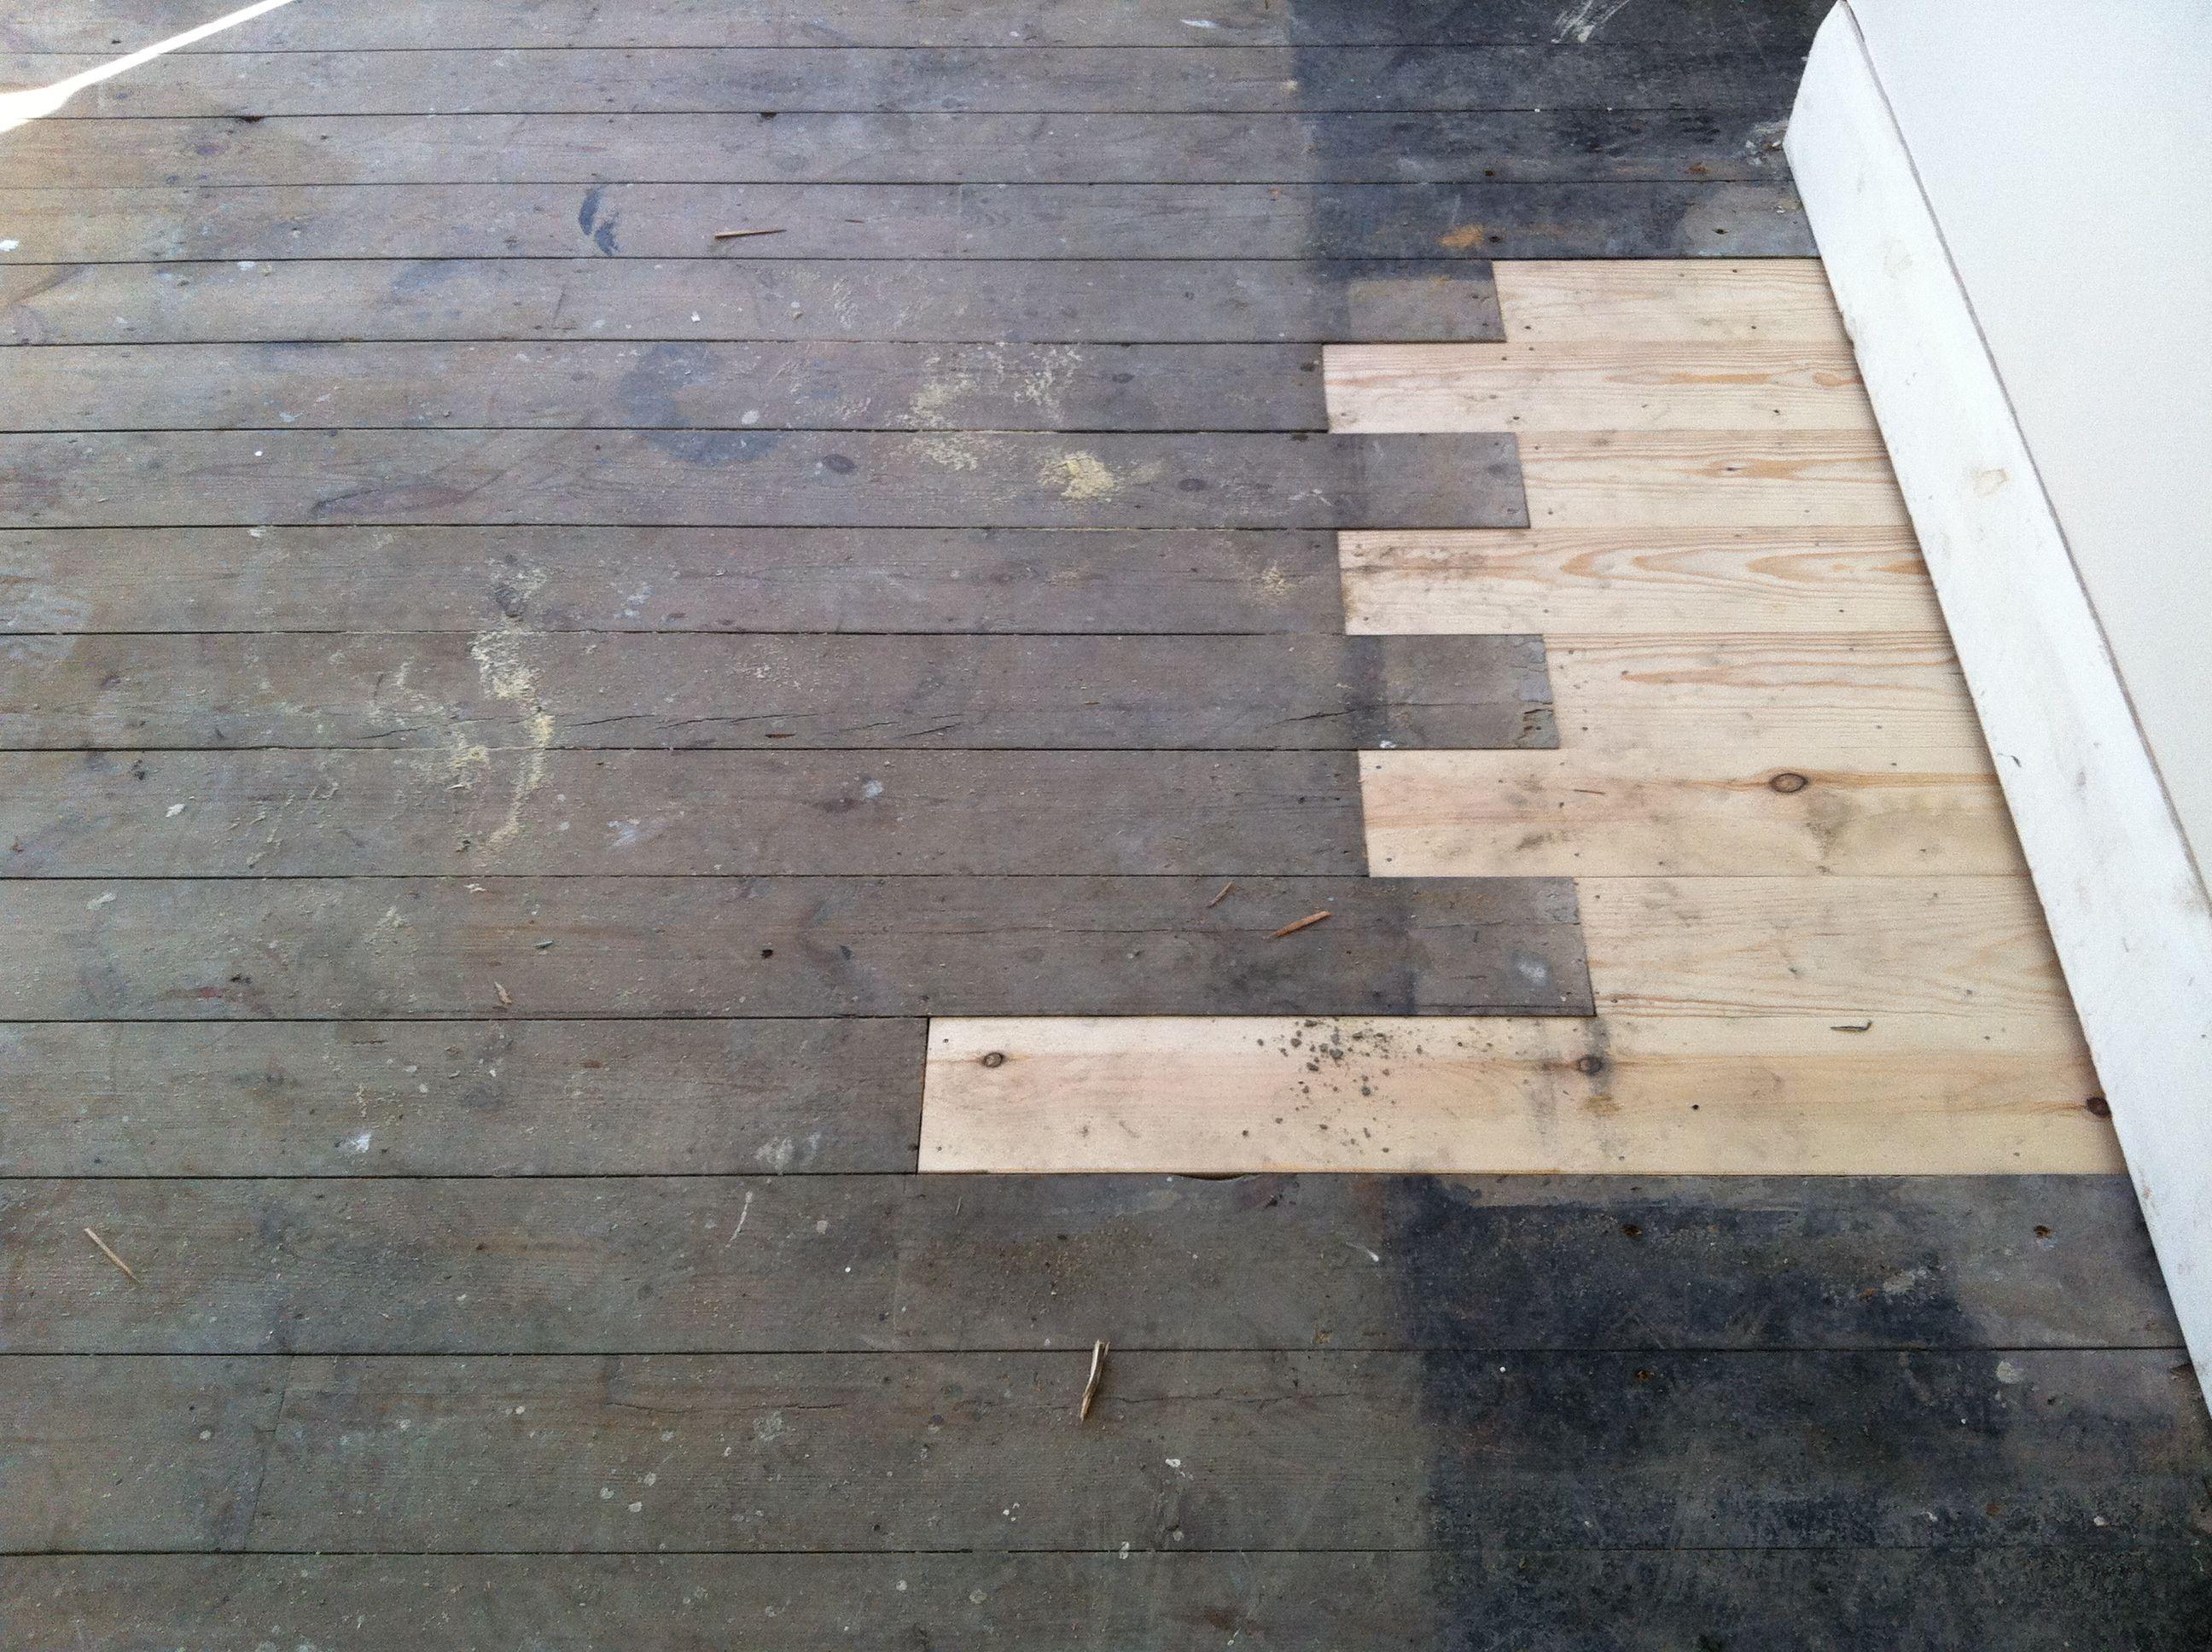 Wood floor repair Wood floor repair, Wood, Parquet flooring